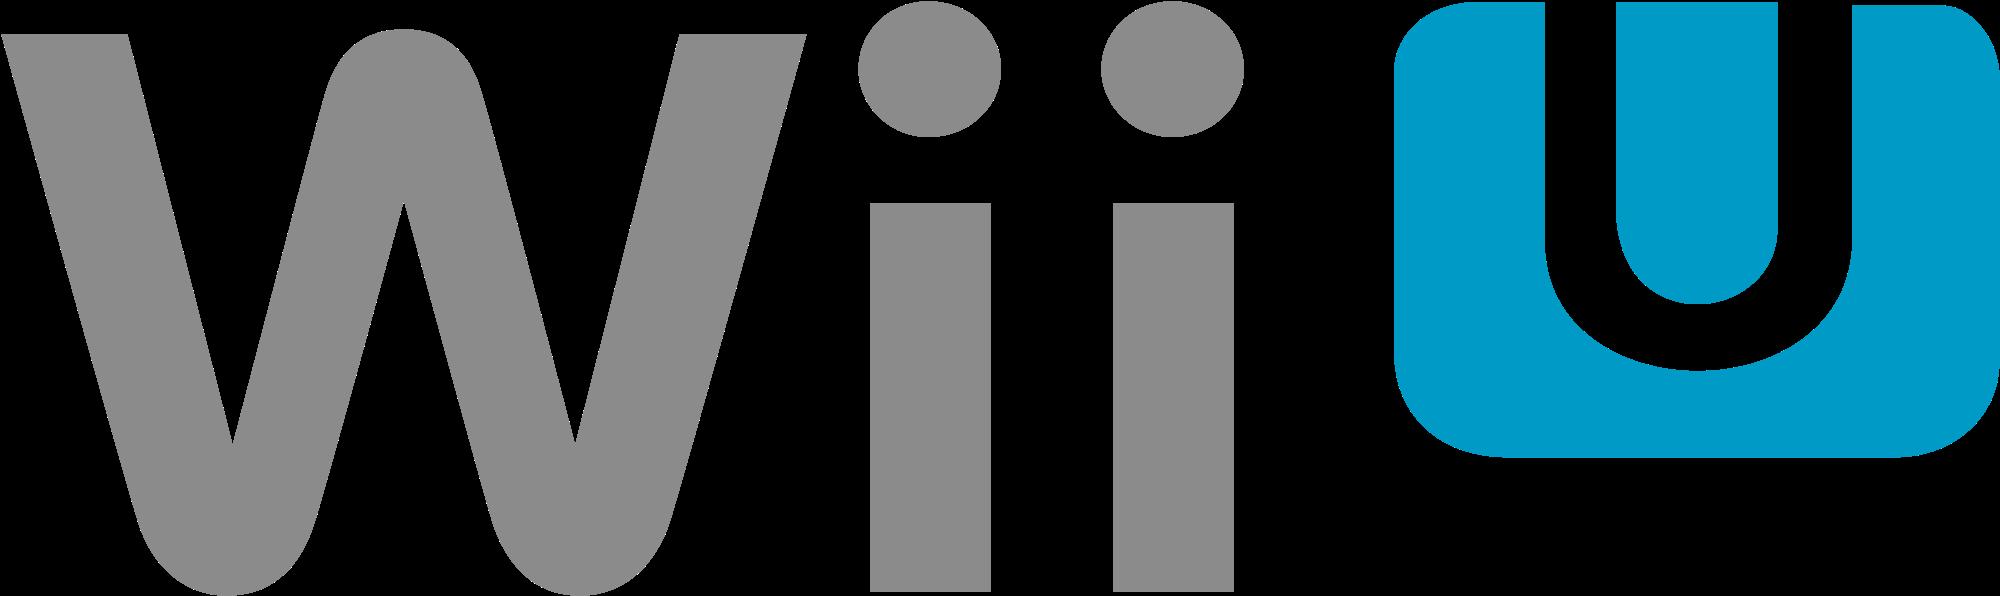 Wii Logo Png Never Alone - Wii U ve...